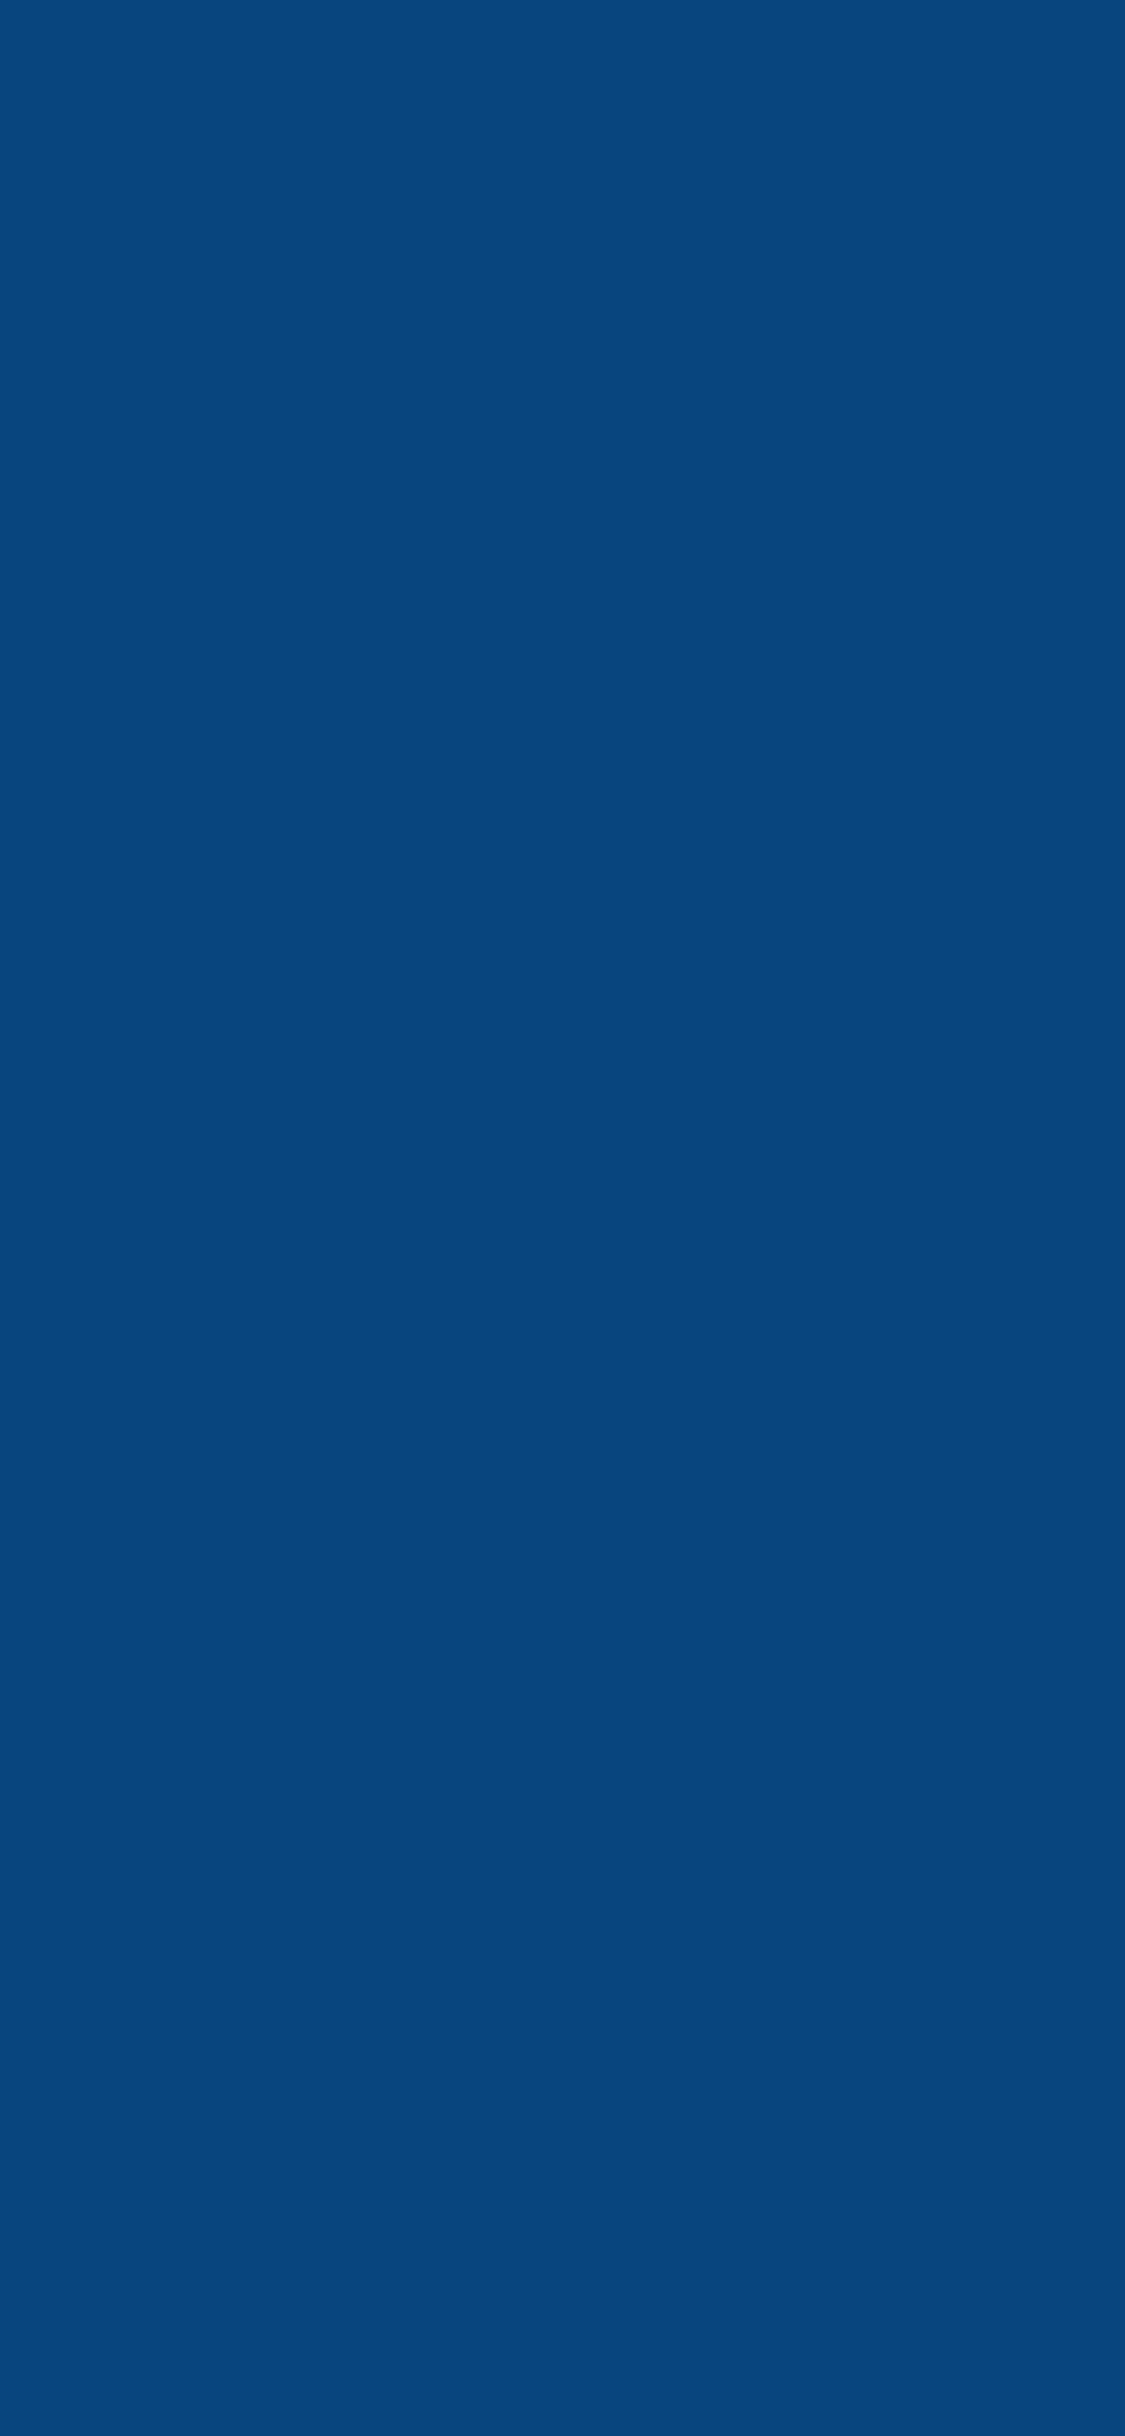 1125x2436 Dark Cerulean Solid Color Background